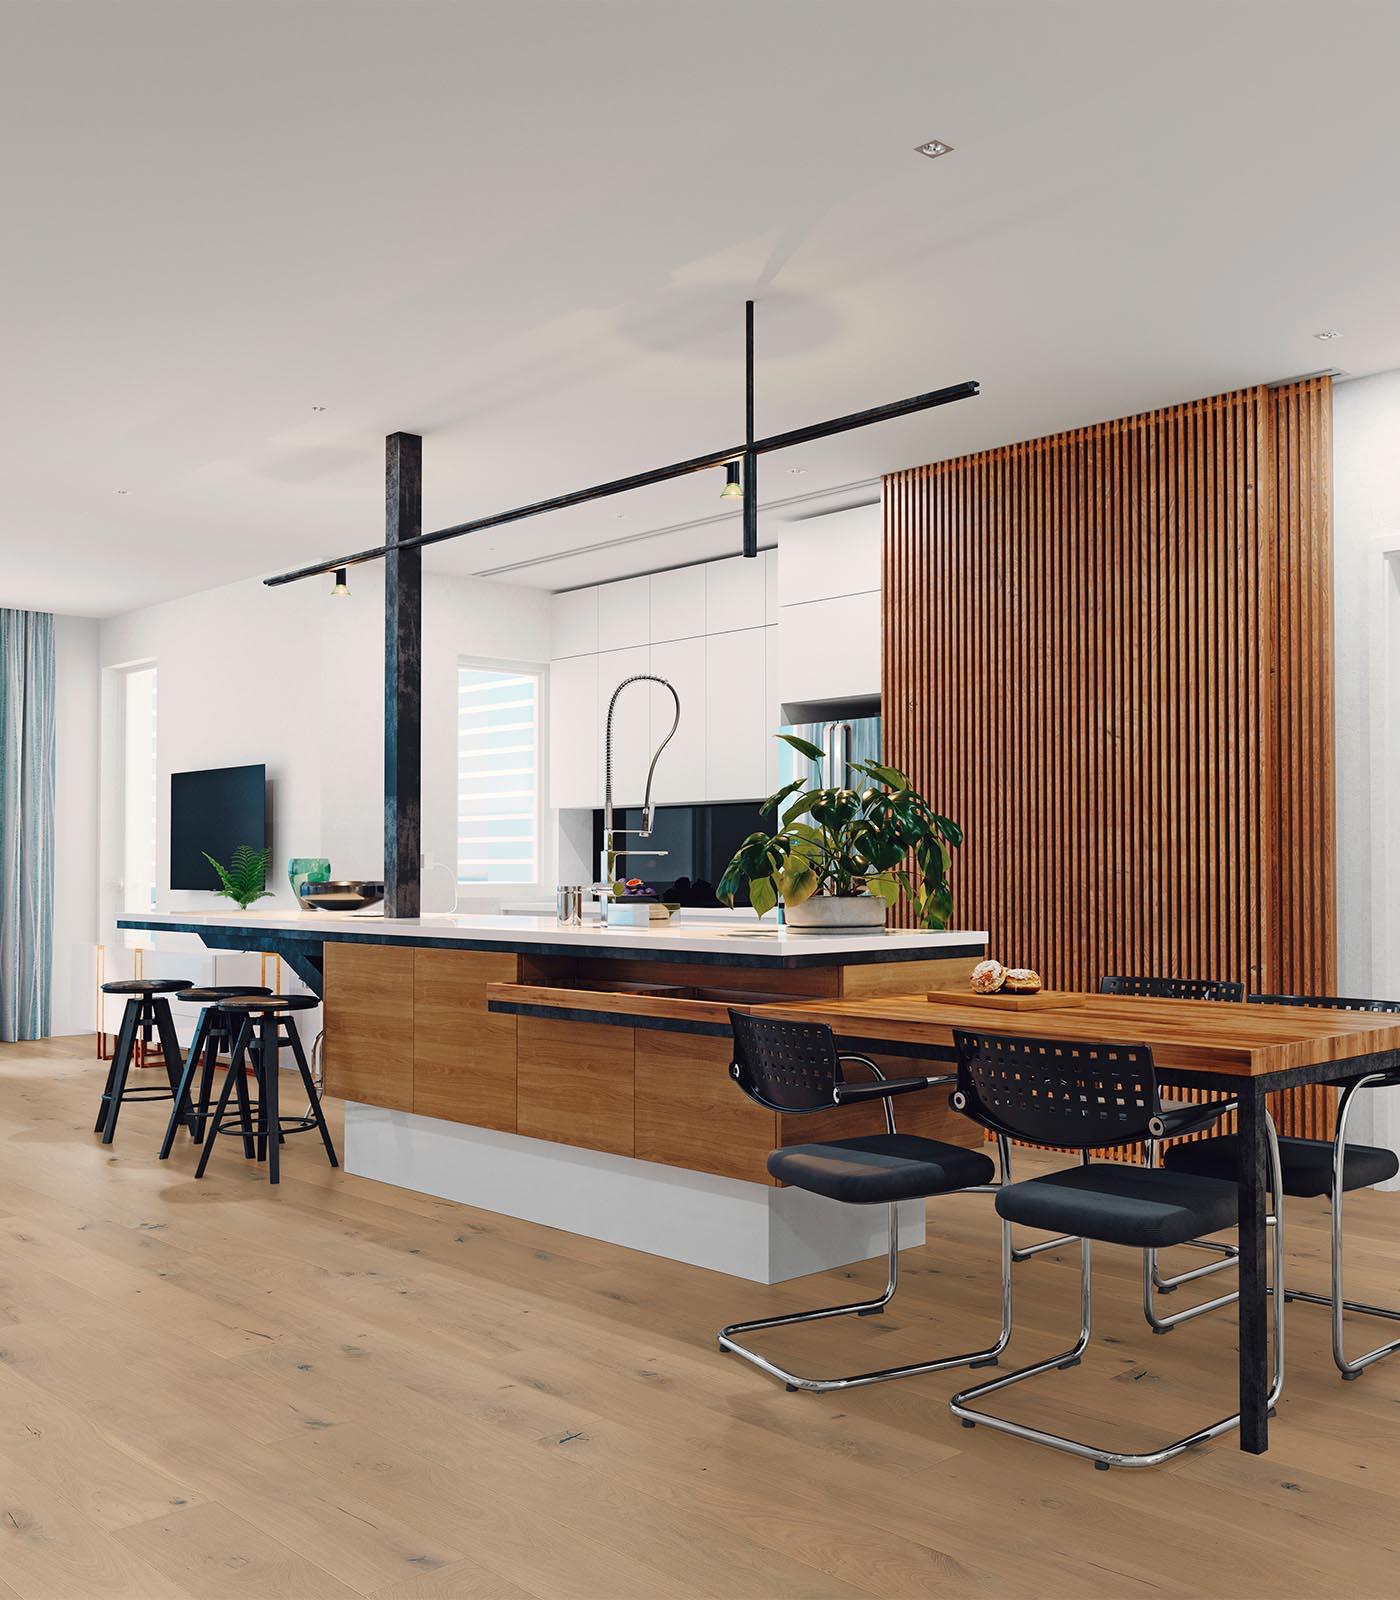 Cayman-Island Collection-European Oak floors-room